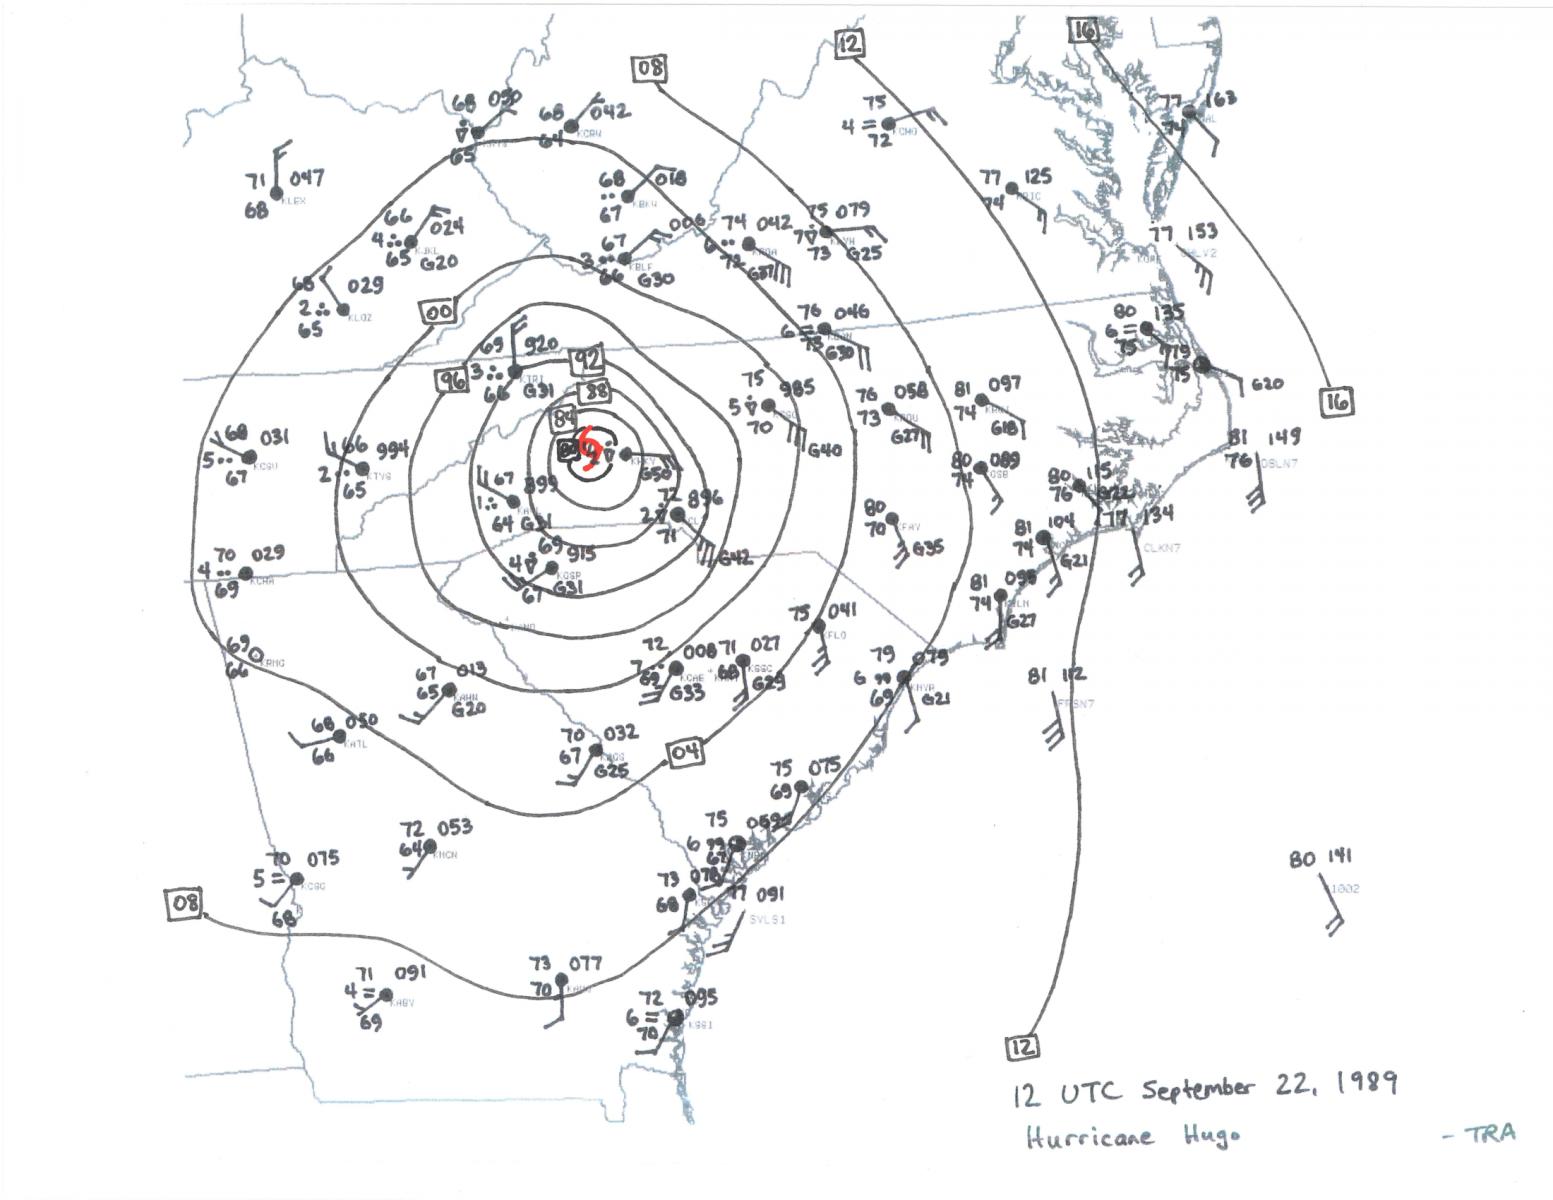 hurricane hugo Home Wiring Diagram sep 22 12z surface map